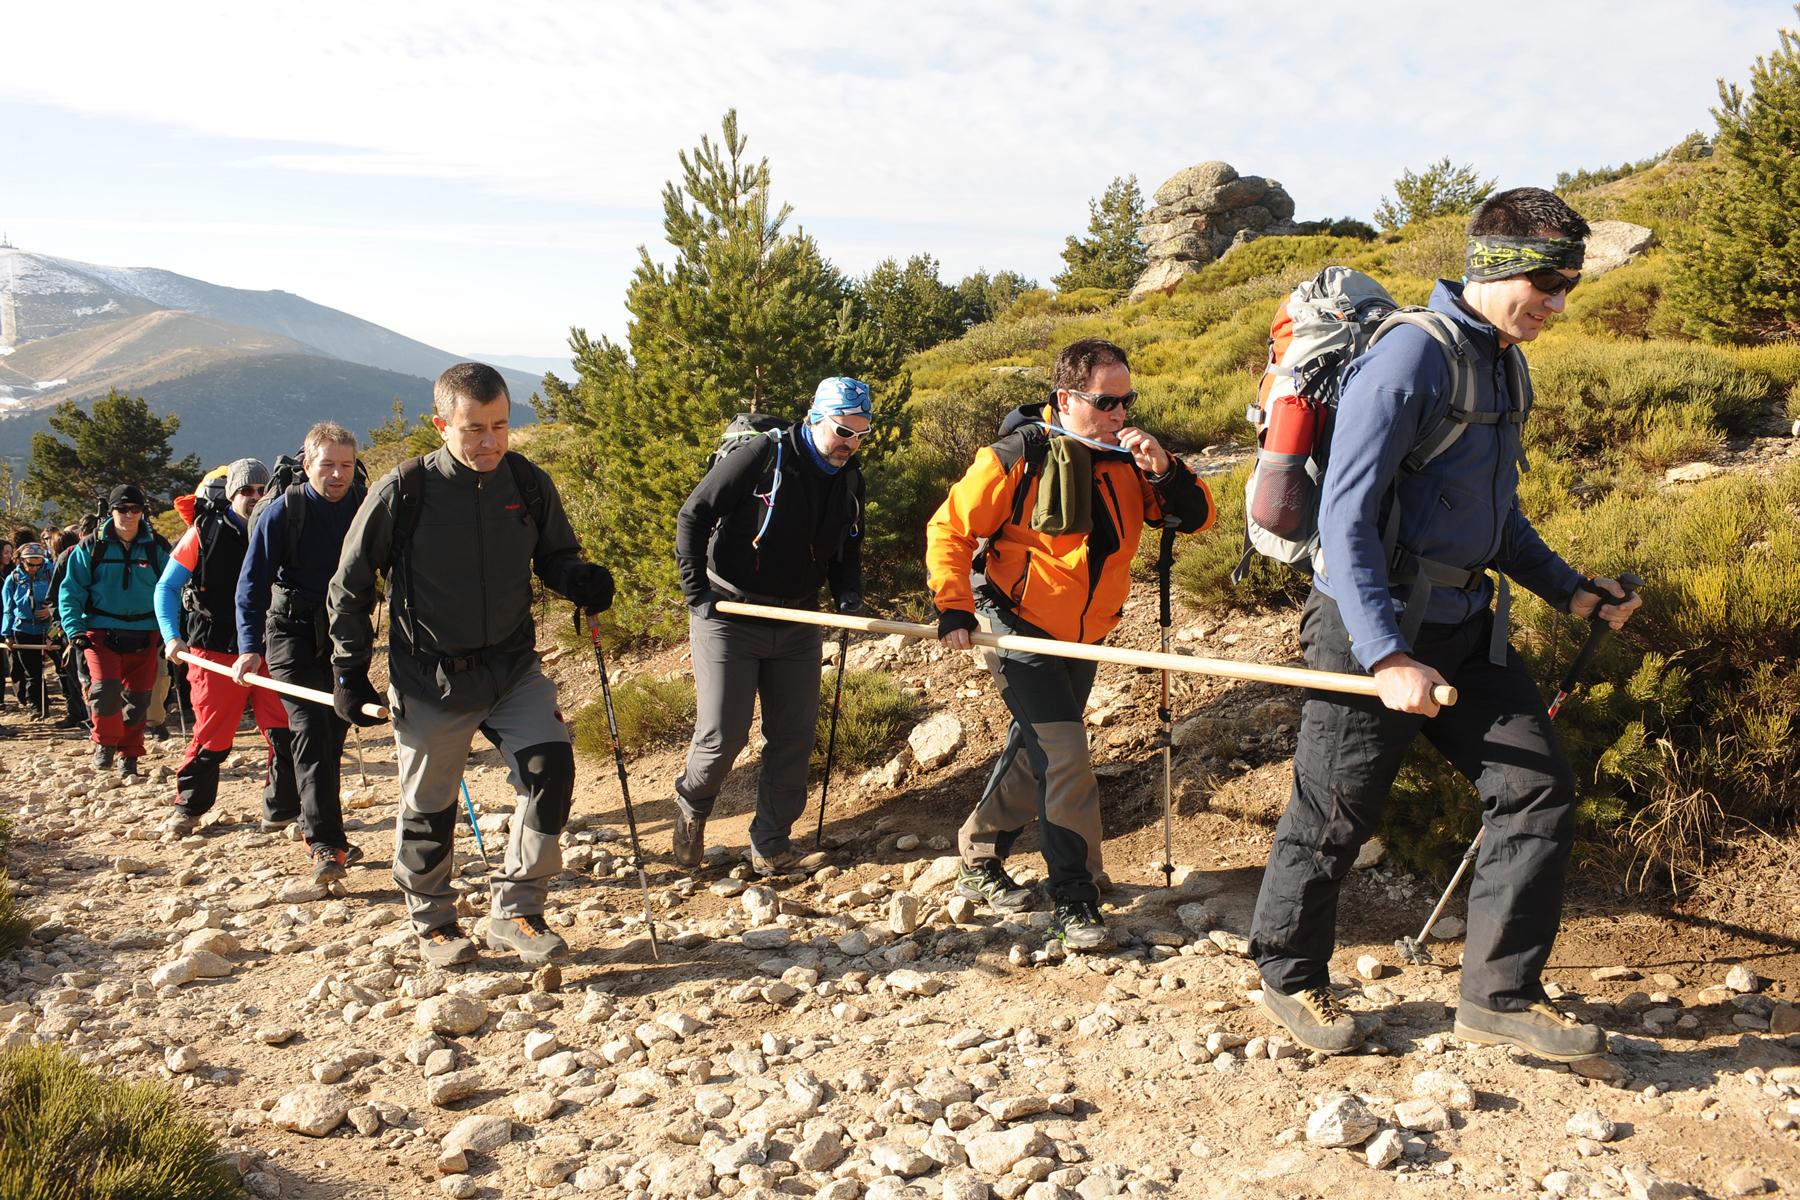 Grupo de montañeros en las pasadas jornadas de montañismo.